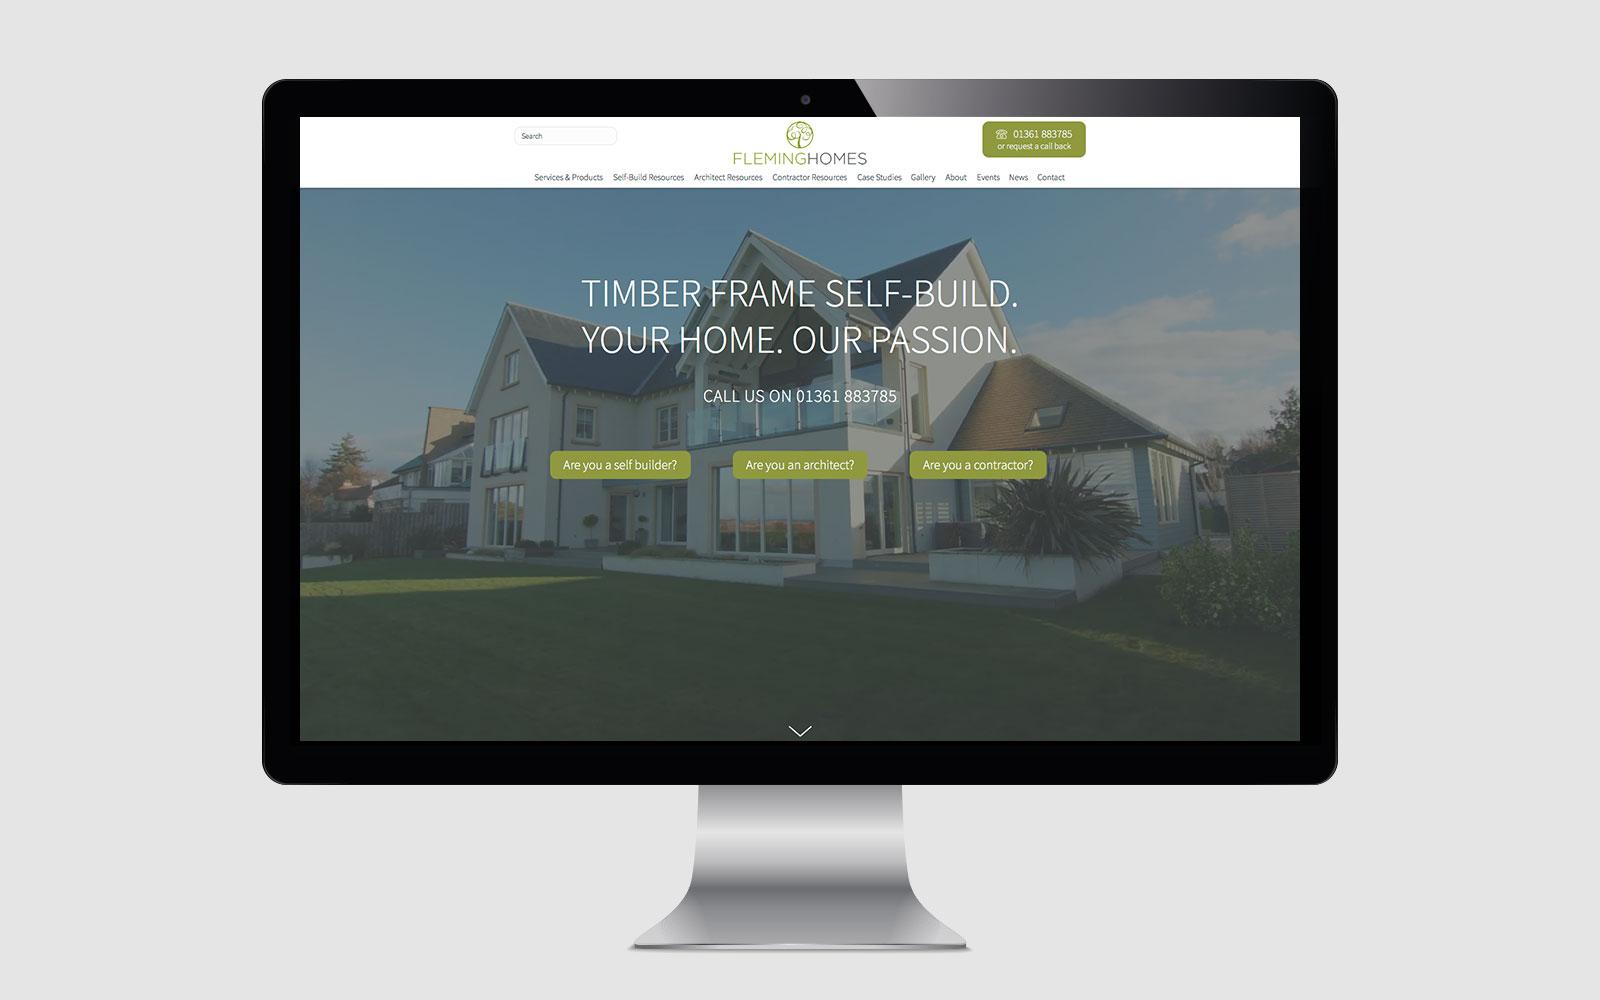 Fleming Homes website